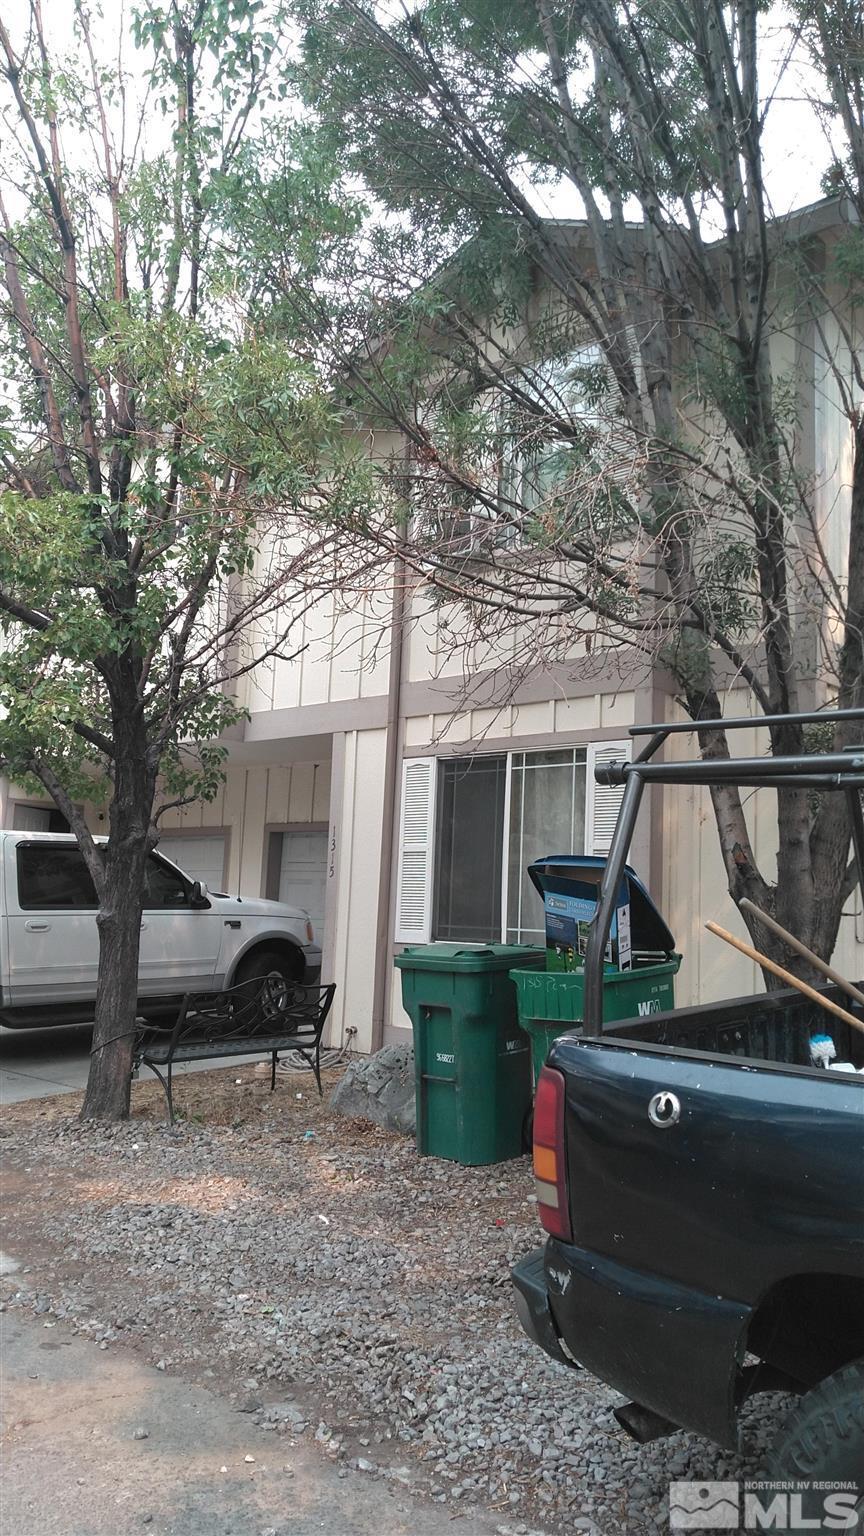 Image for 1313 & 1315 Powell Ln, Reno, NV 89502